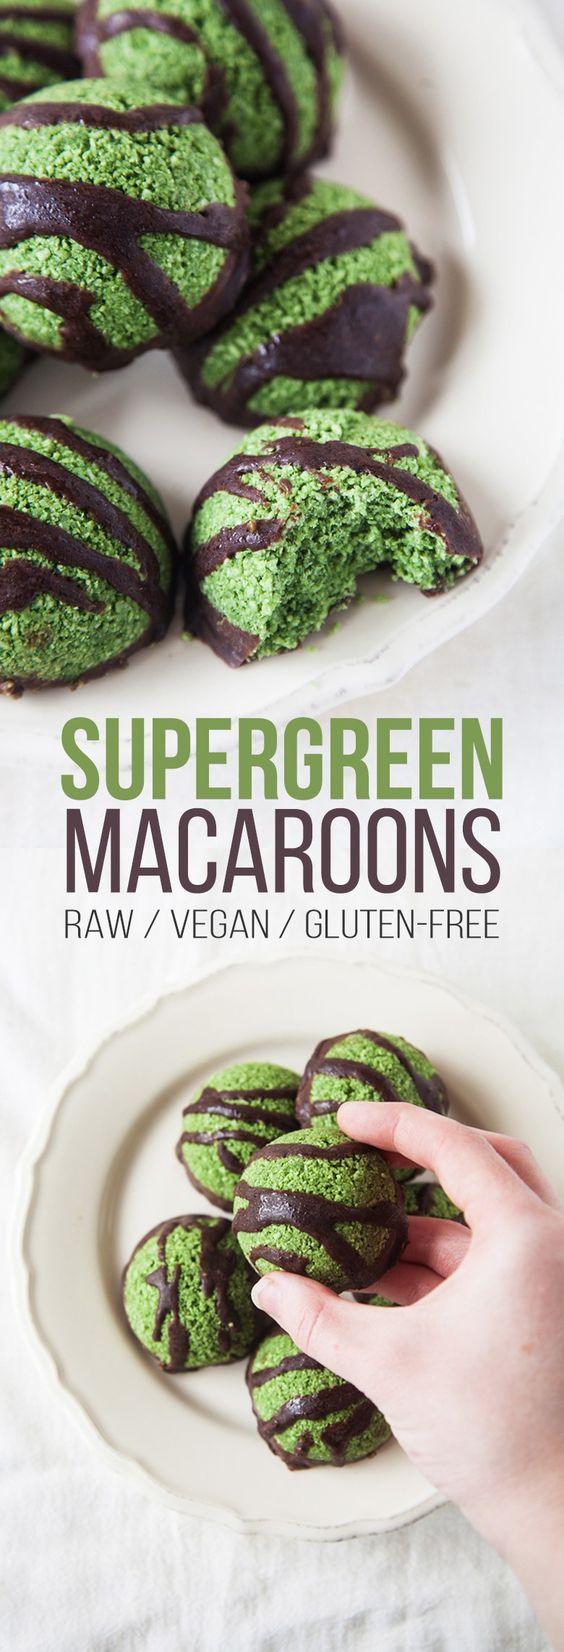 Raw Supergreen Macaroons